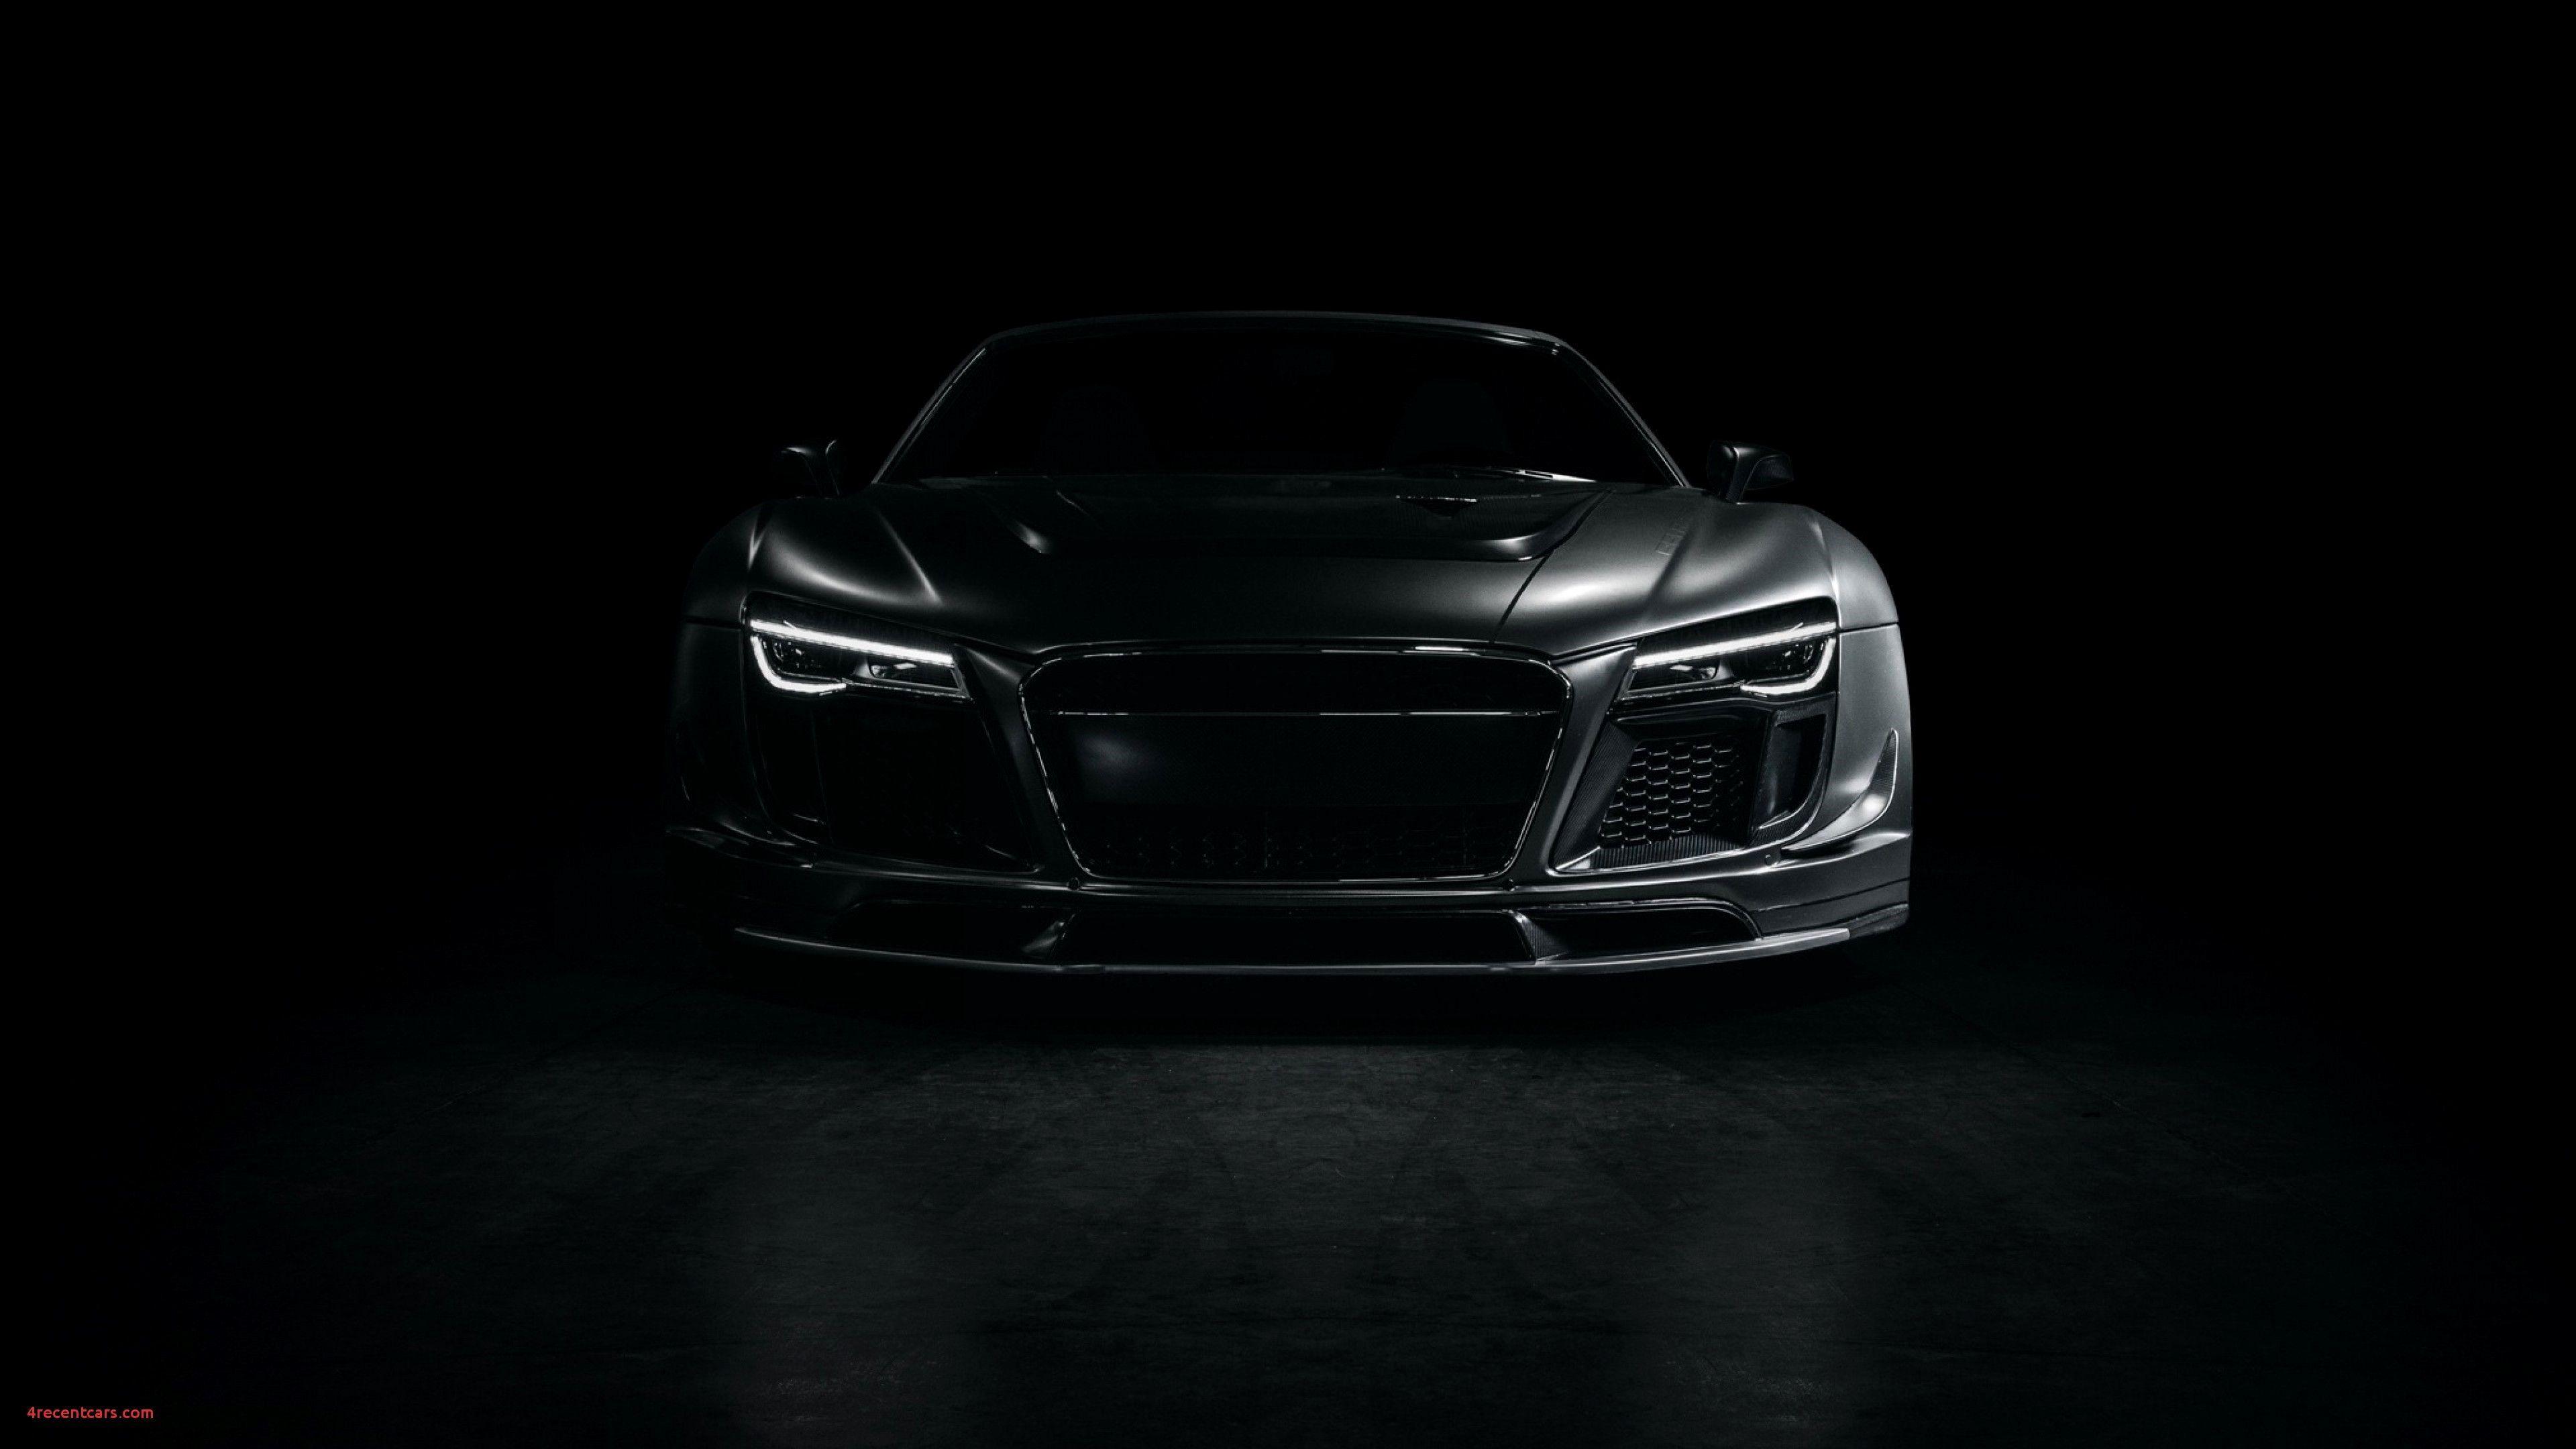 Dark Wallpaper 4k For Windows 10 Ideas Supercars Wallpaper Black Car Wallpaper Black Audi